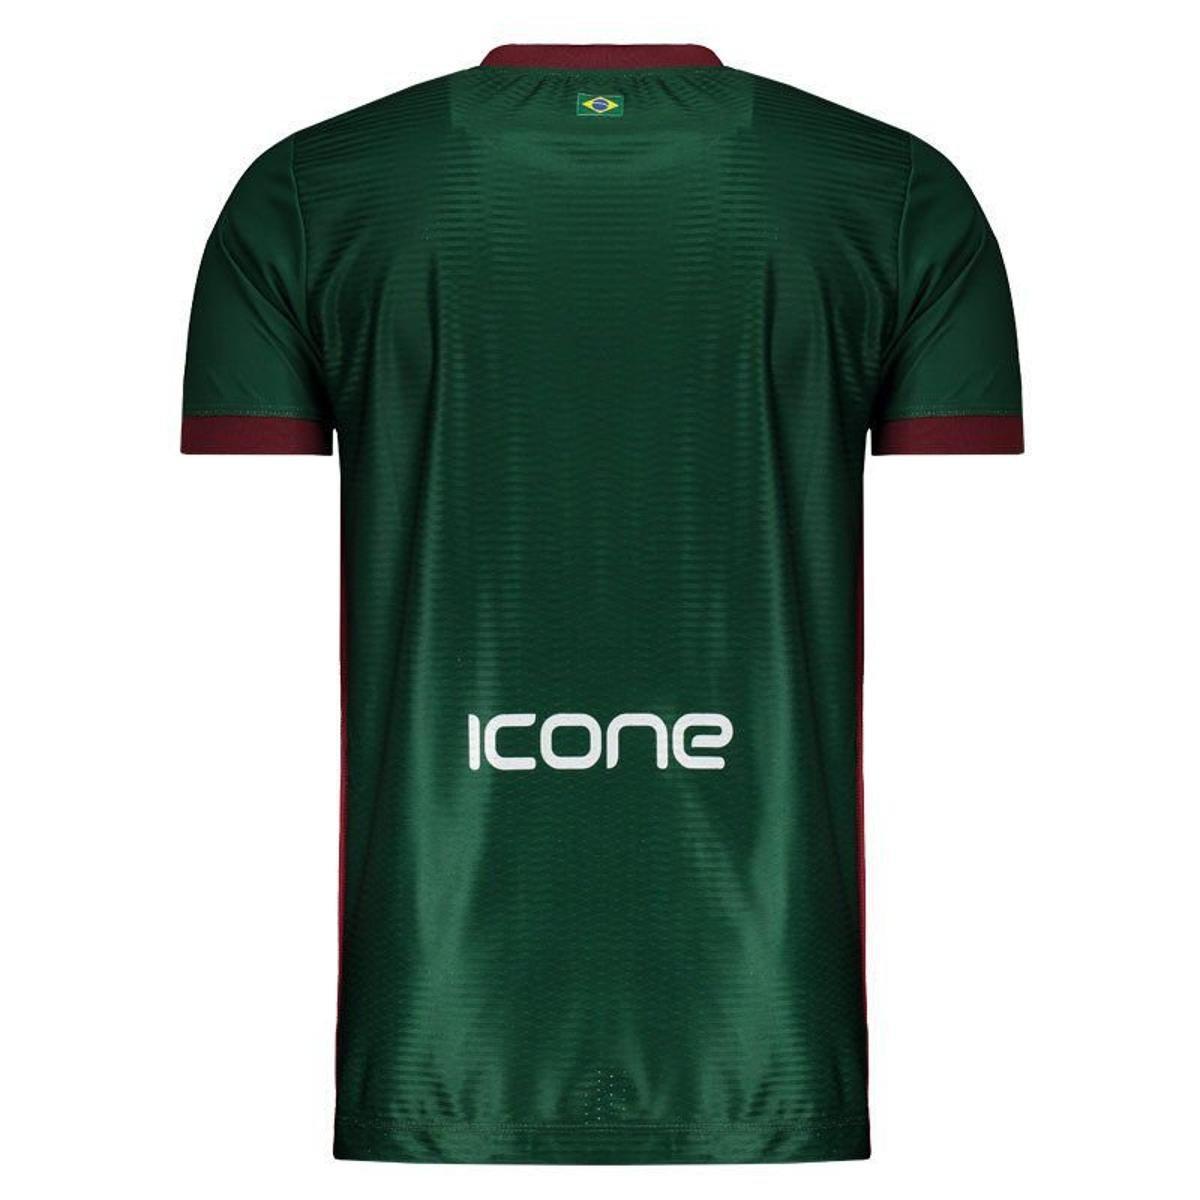 f3b5b6b773 Camisa Ícone Sports Portuguesa III 2018 Masculina - Compre Agora ...